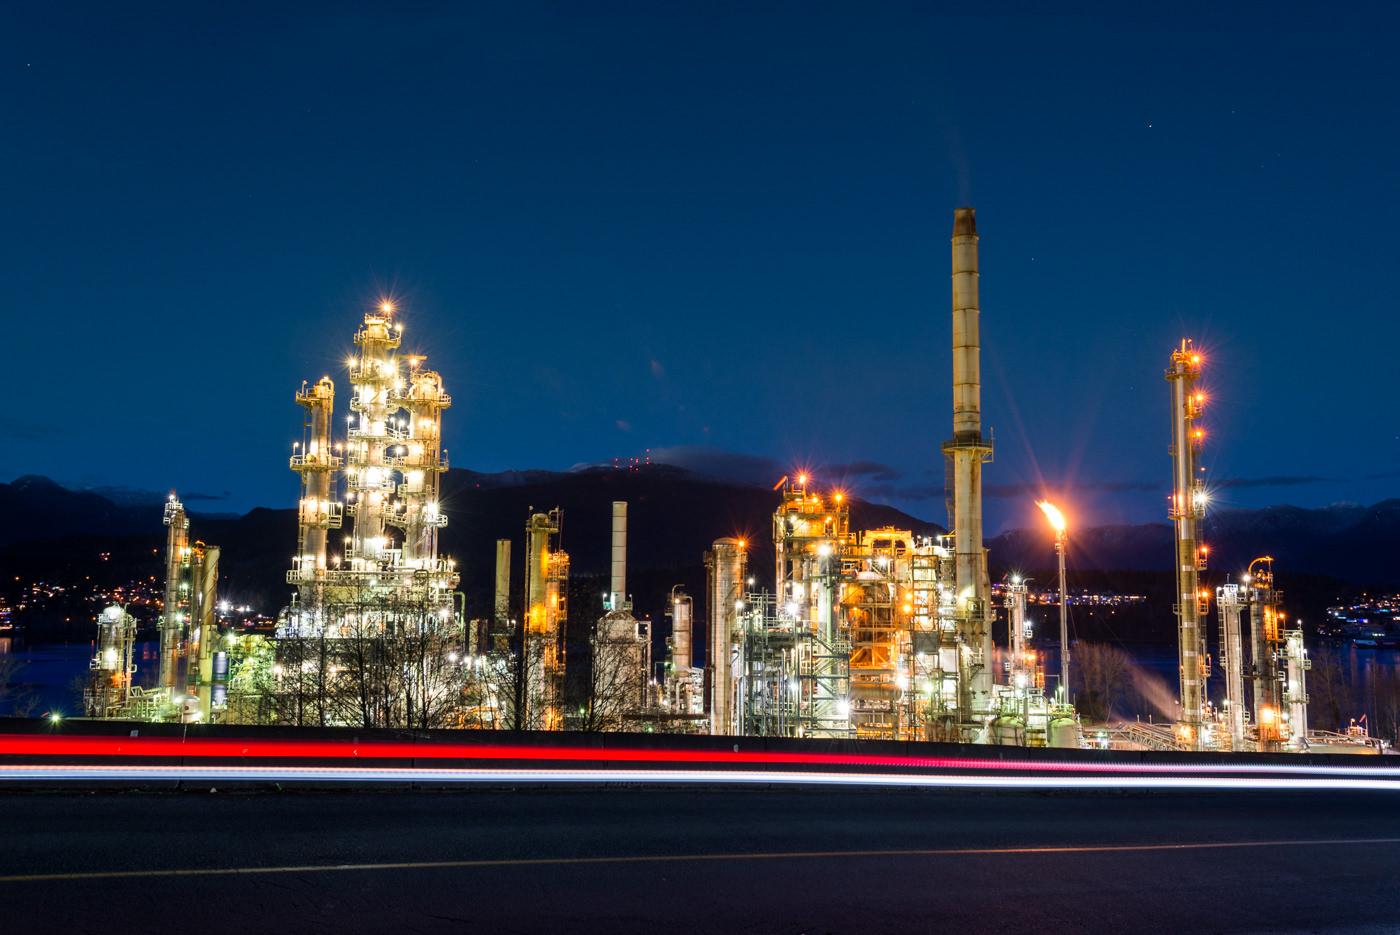 Industrial Paradise New Landscape Architecture Photo Series